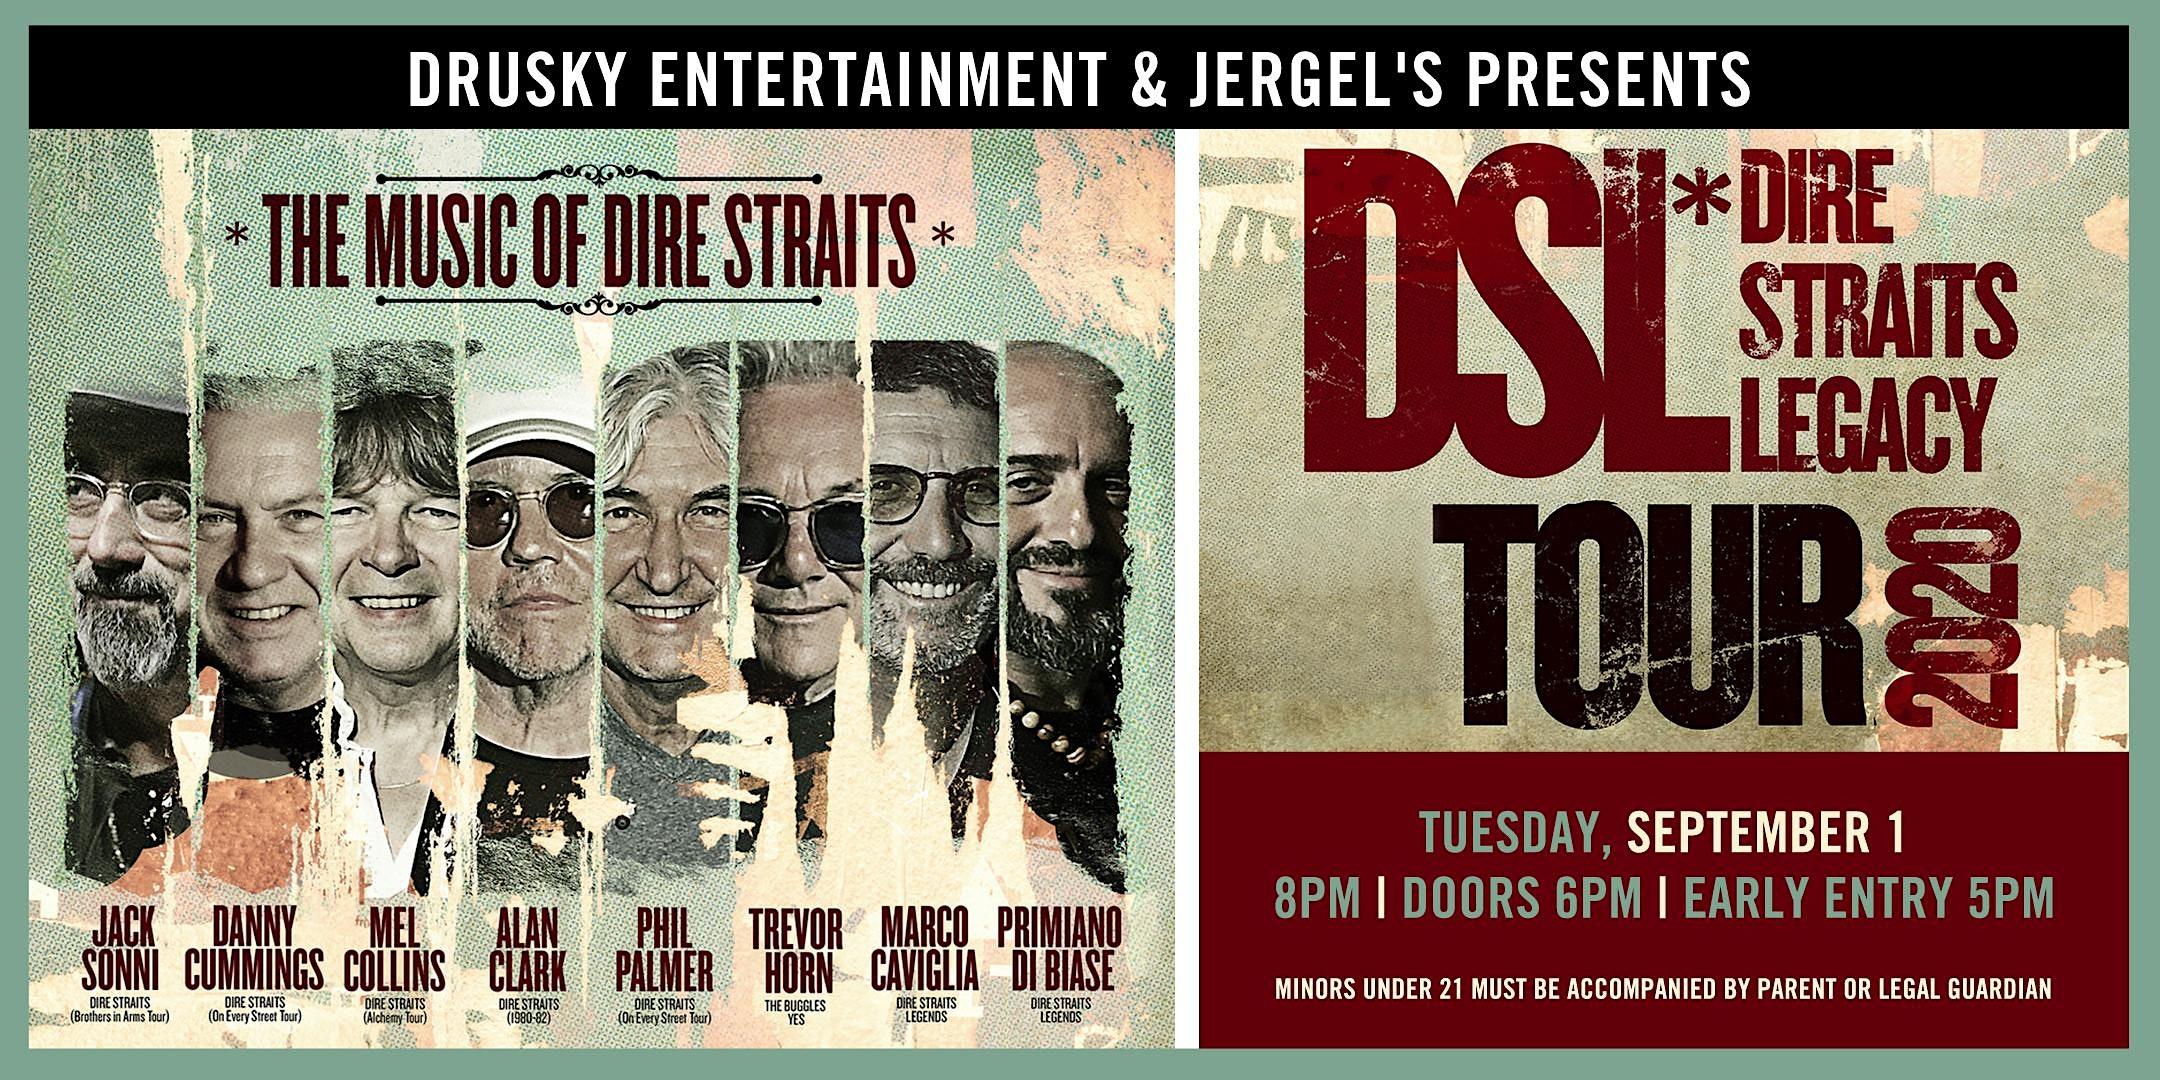 Drusky Entertainment Dire Straits Legacy Tickets Jergels